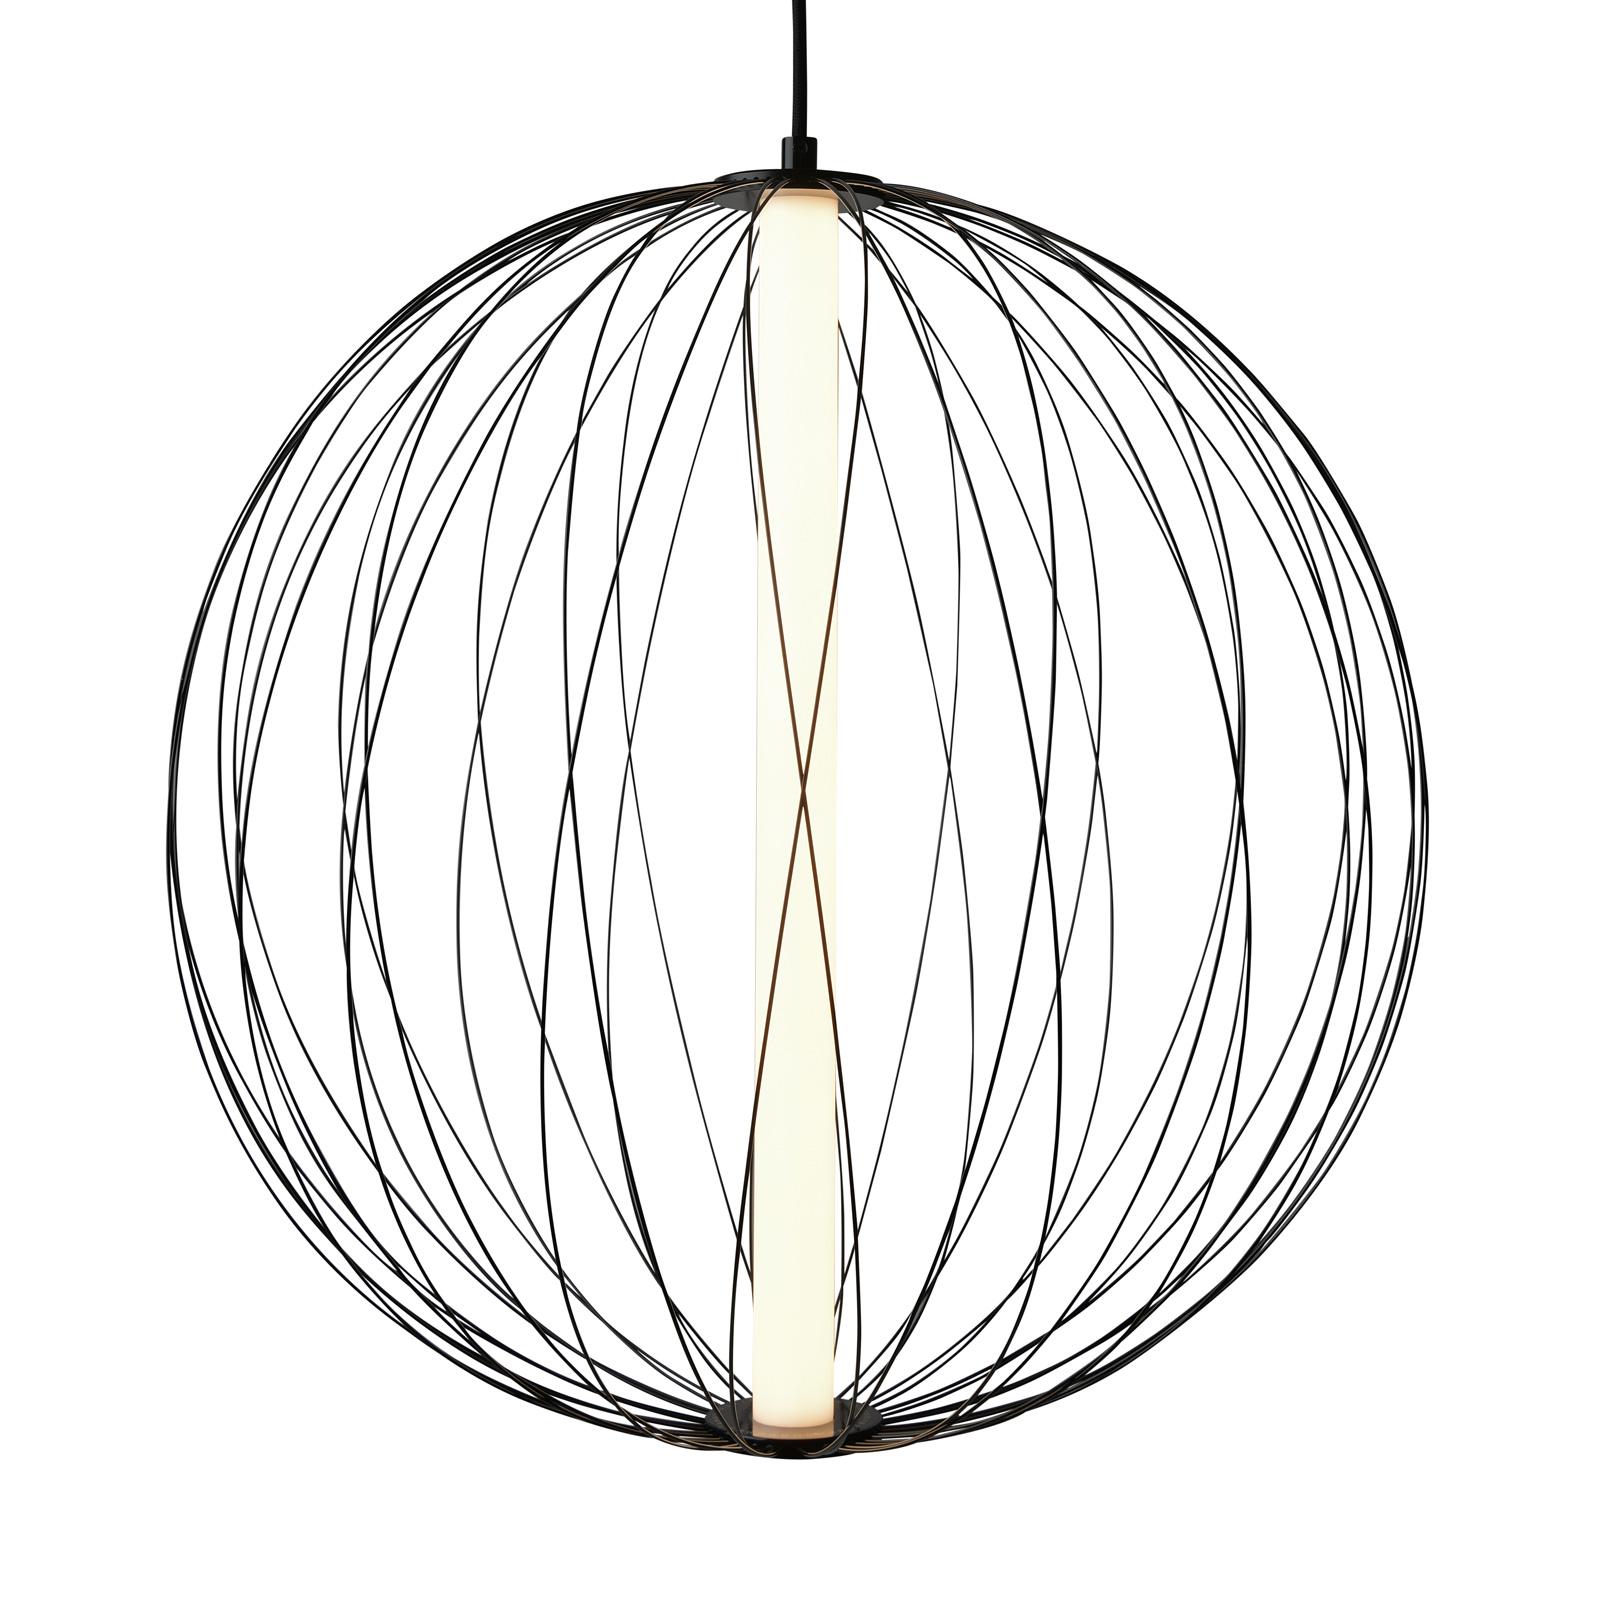 Lampa wisząca LED Atomic o regulowanym kloszu